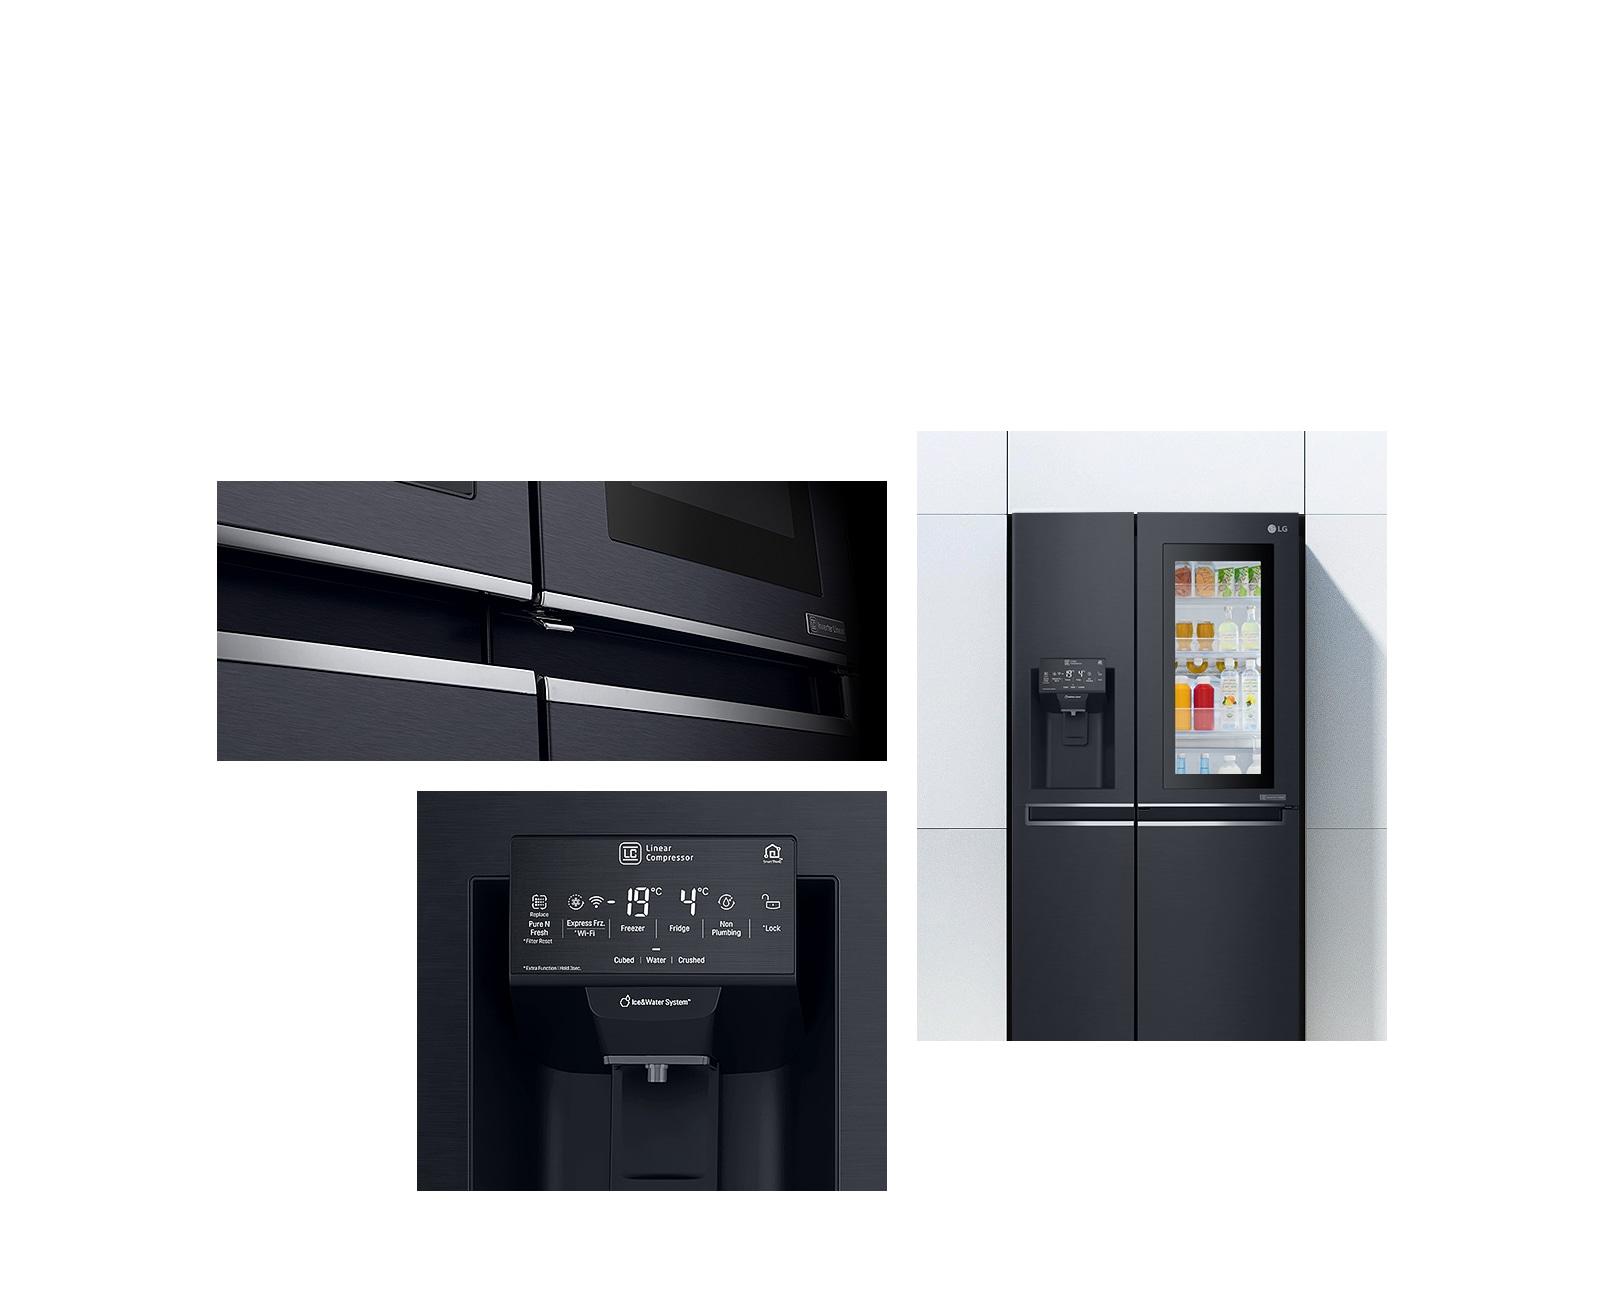 P-Veyron6-Refresh-InstaView-MatteBlackST-Nplumbing-14-Design-D